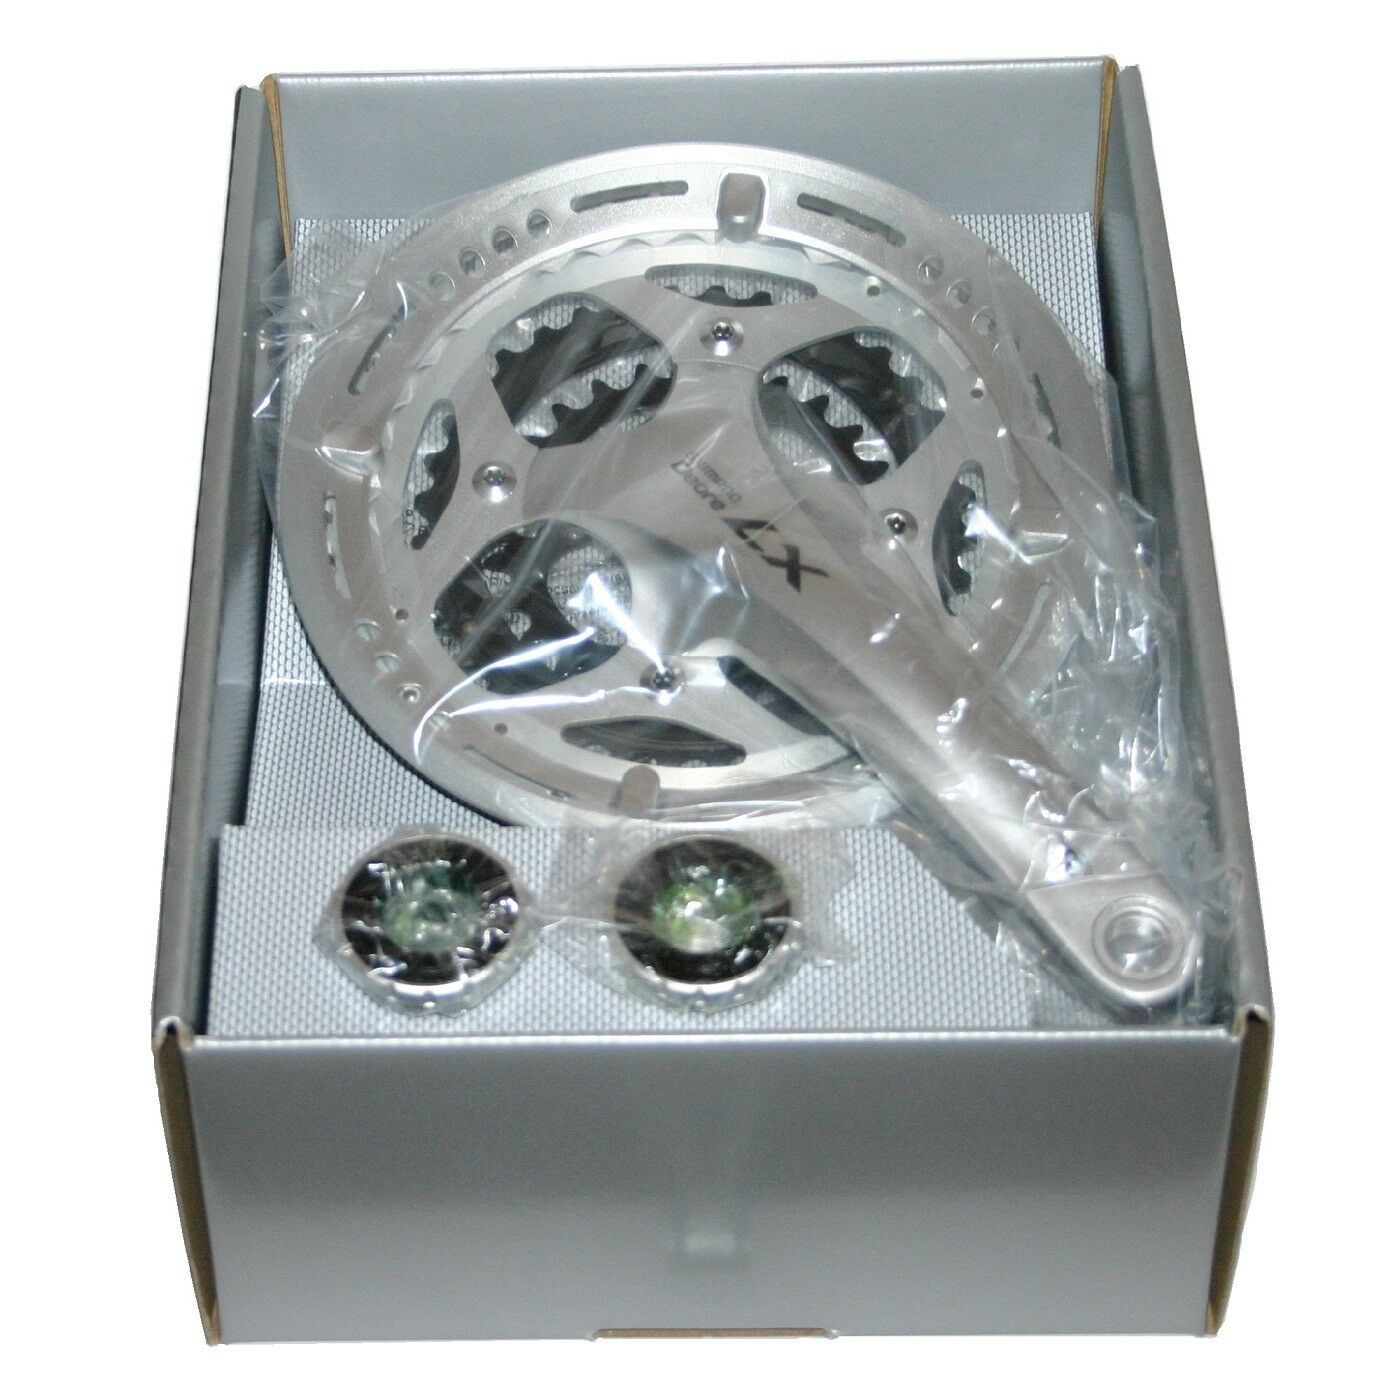 Shimano Deore LX 3x9 manivela crankset fc-t661 m. rodamiento sm-bb70 para sl-t660